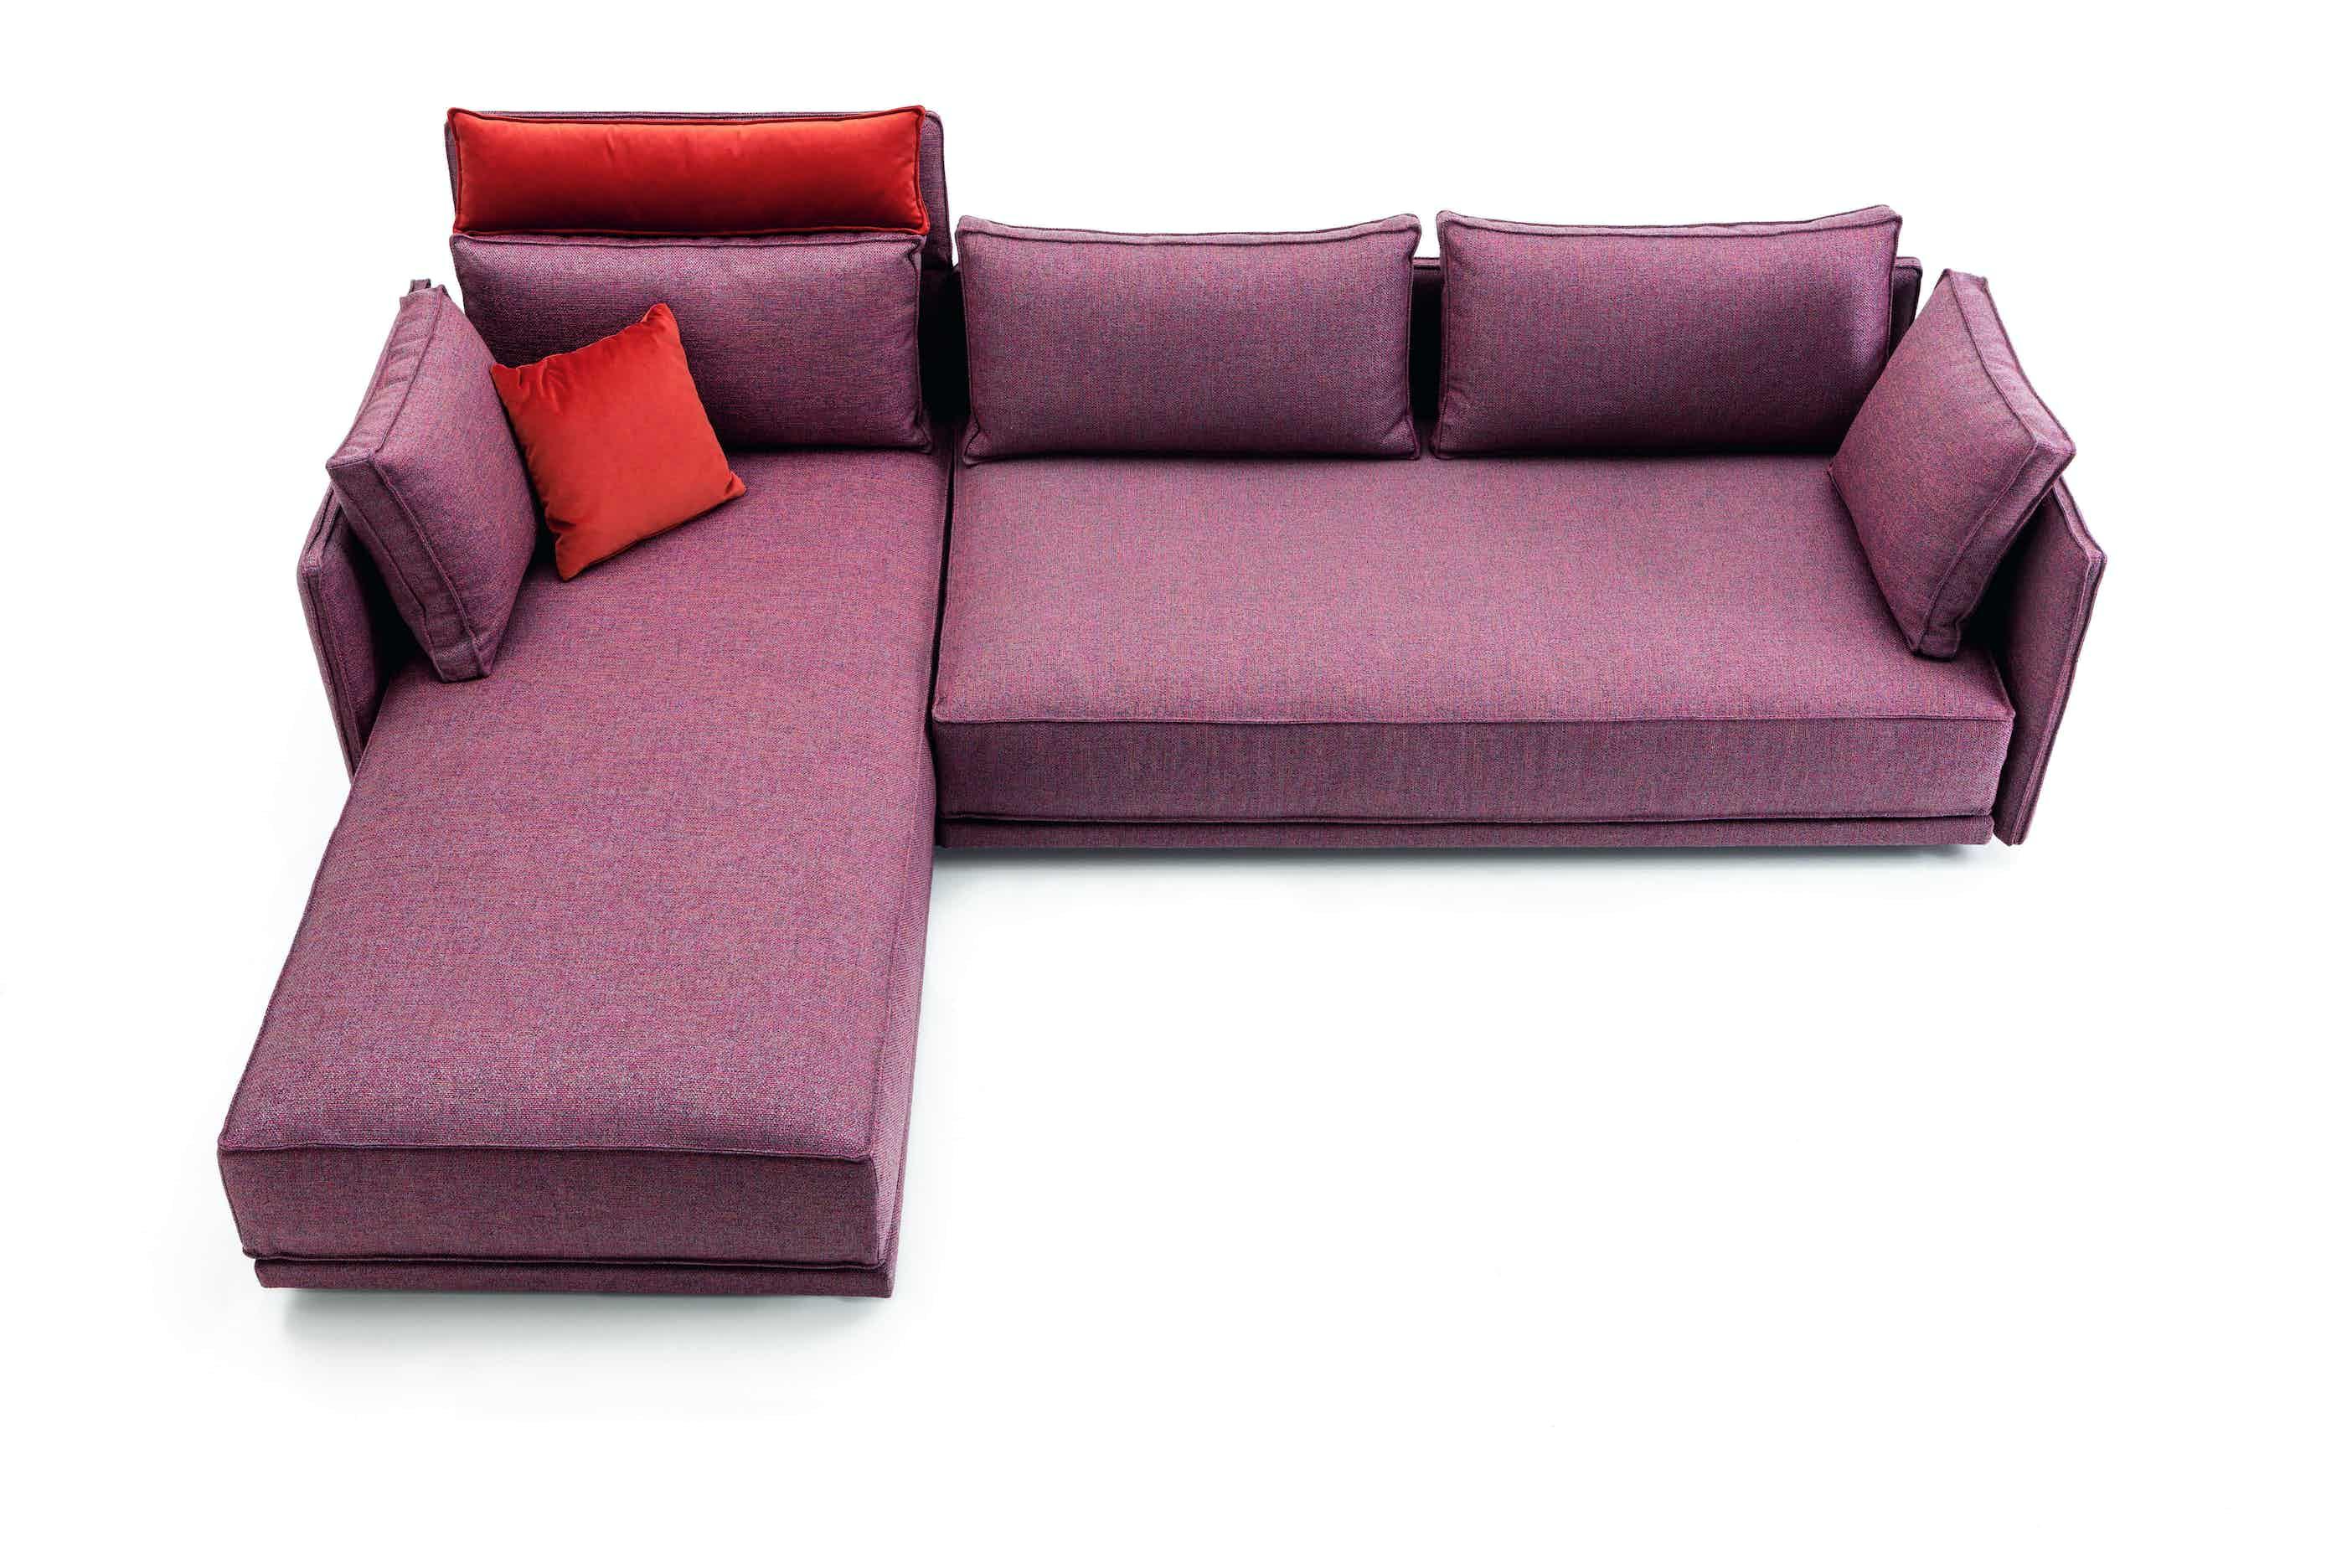 Jab Anstoetz Red Cube Lounge Modular Sofa Haute Living